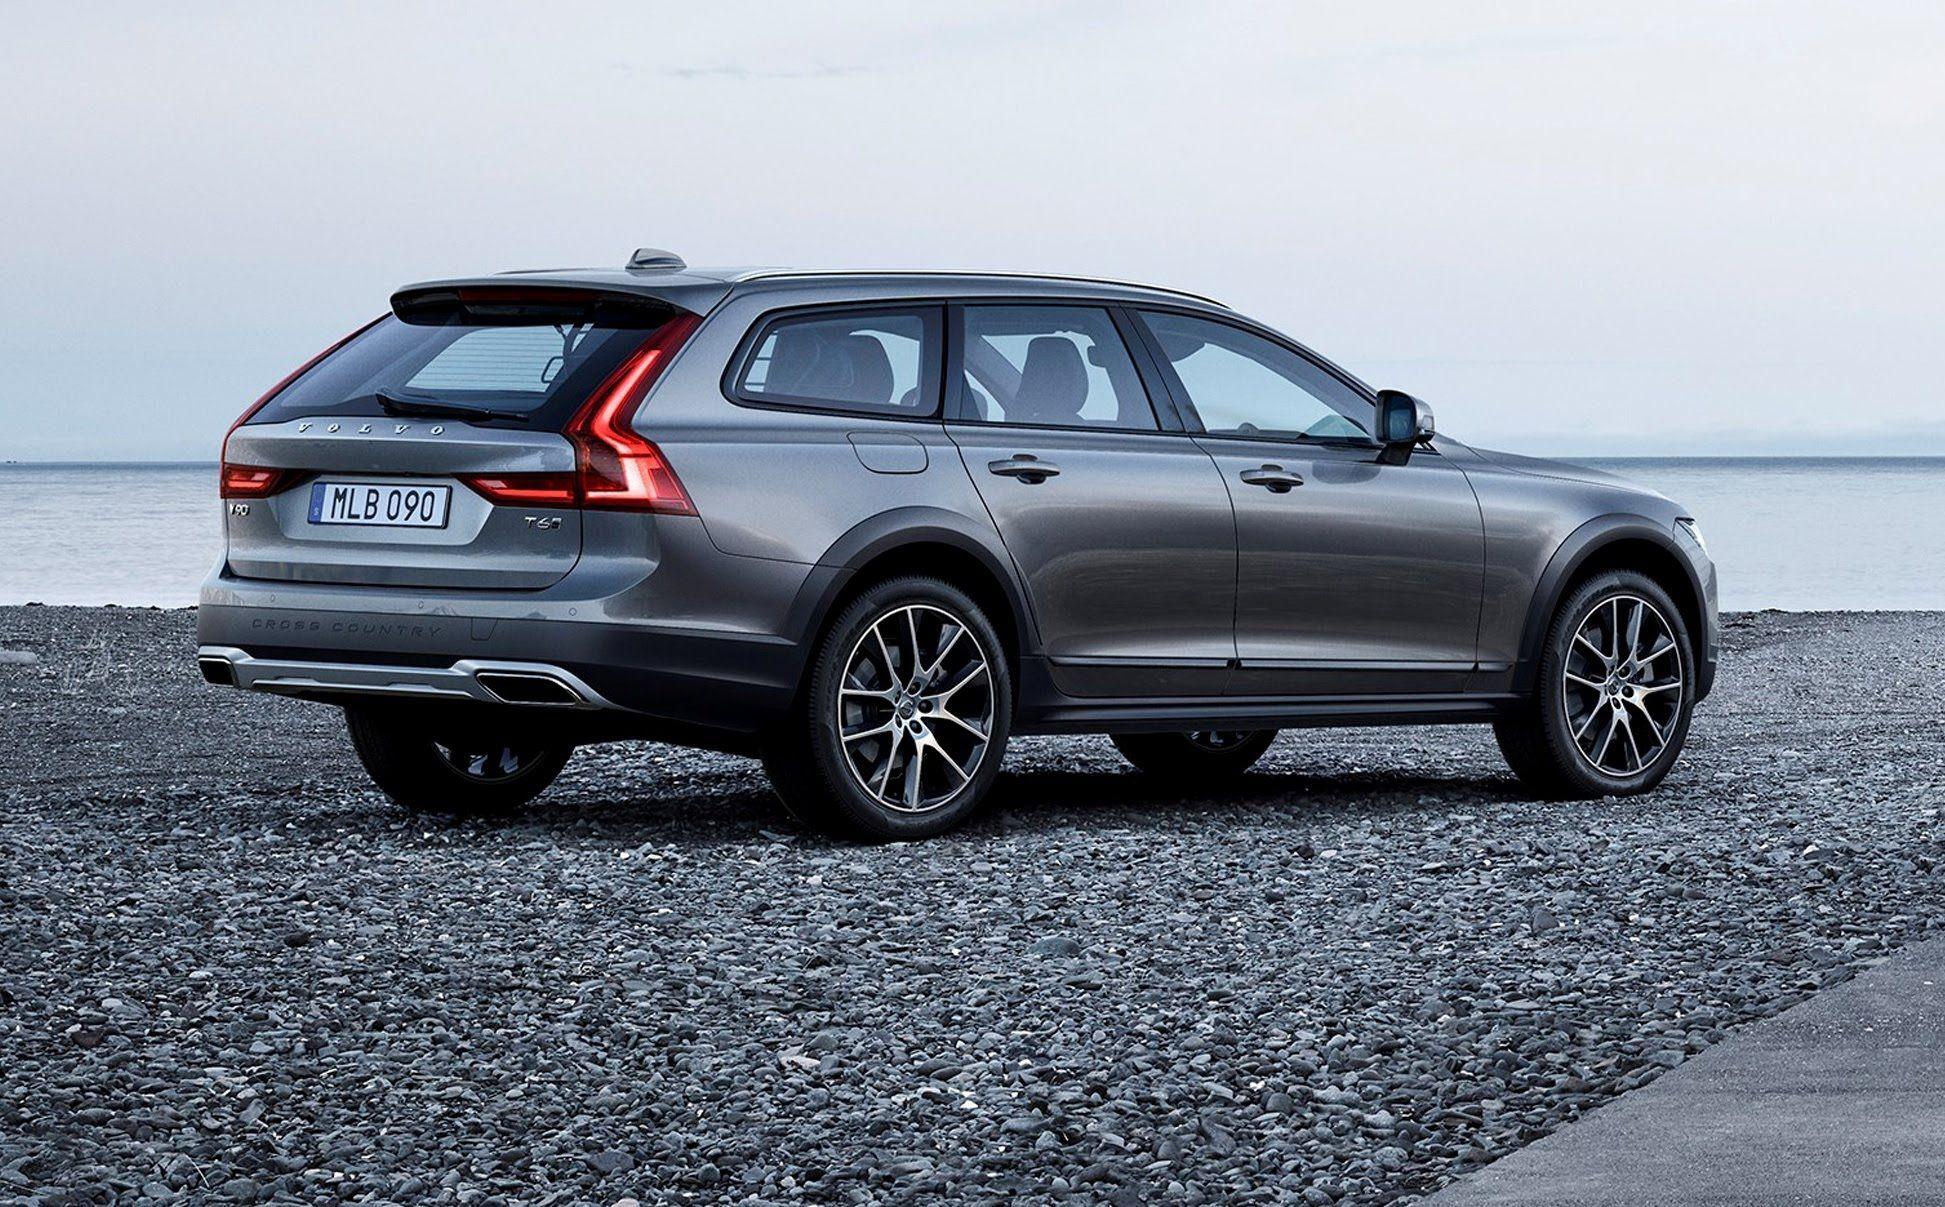 2017 Volvo V90 Cross Country Auto S En Motoren Motor Auto S